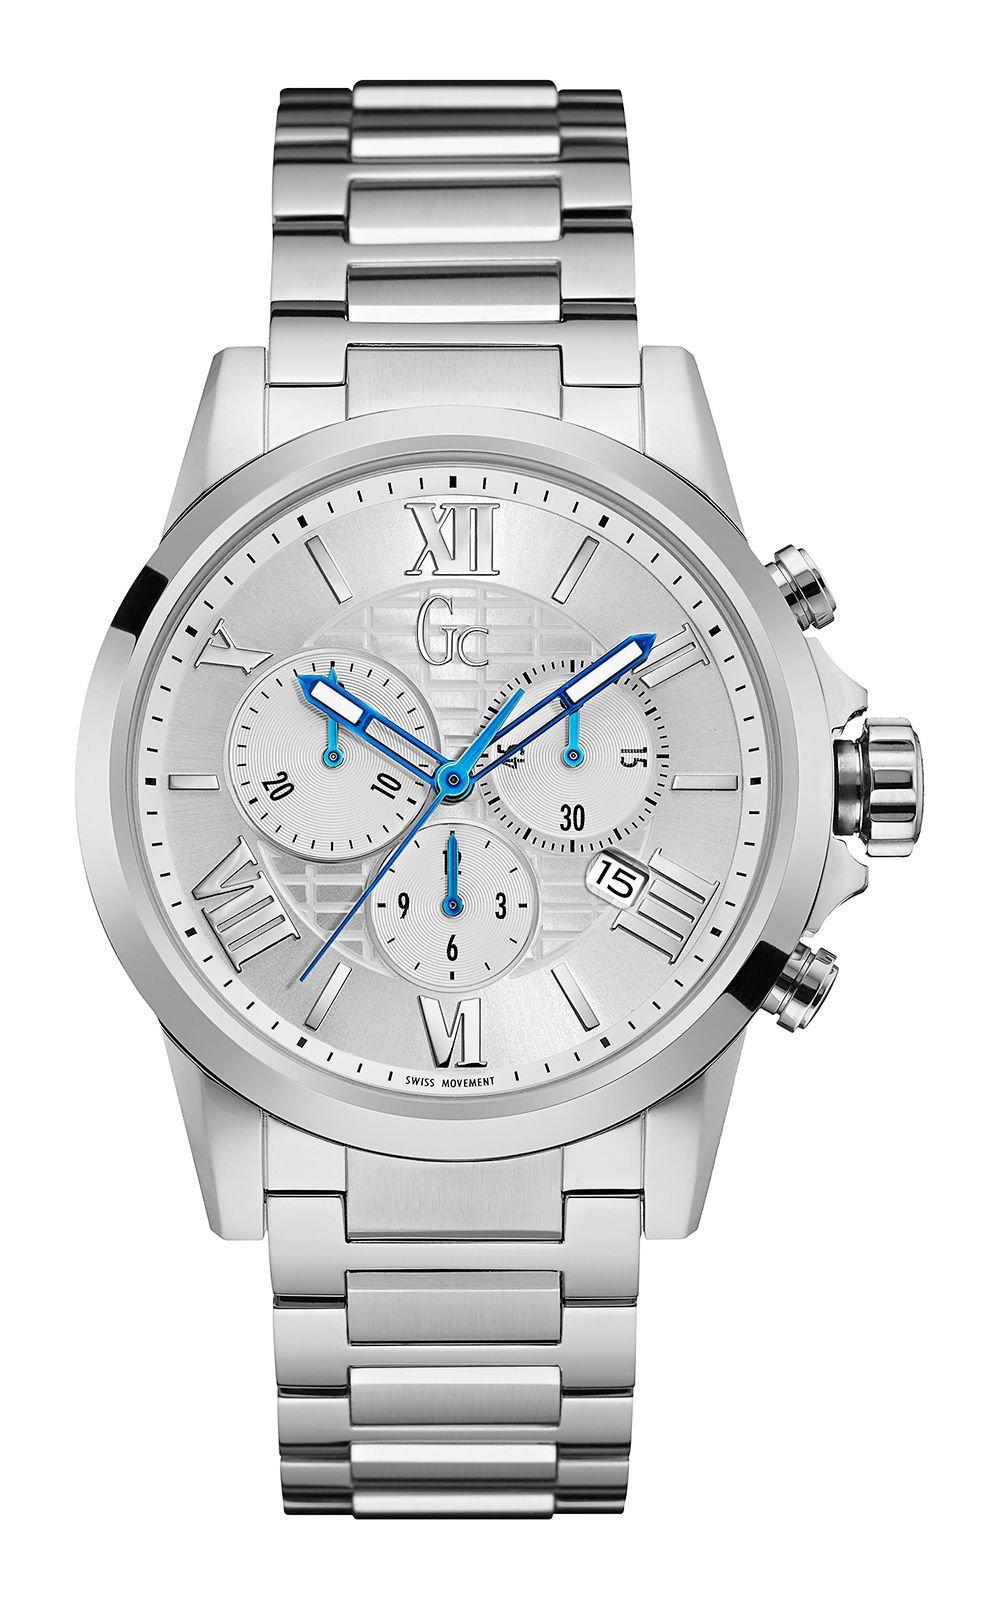 GC X72025G7S Ανδρικό Ρολόι Quartz Χρονογράφος Ακριβείας e62cc8cccb5